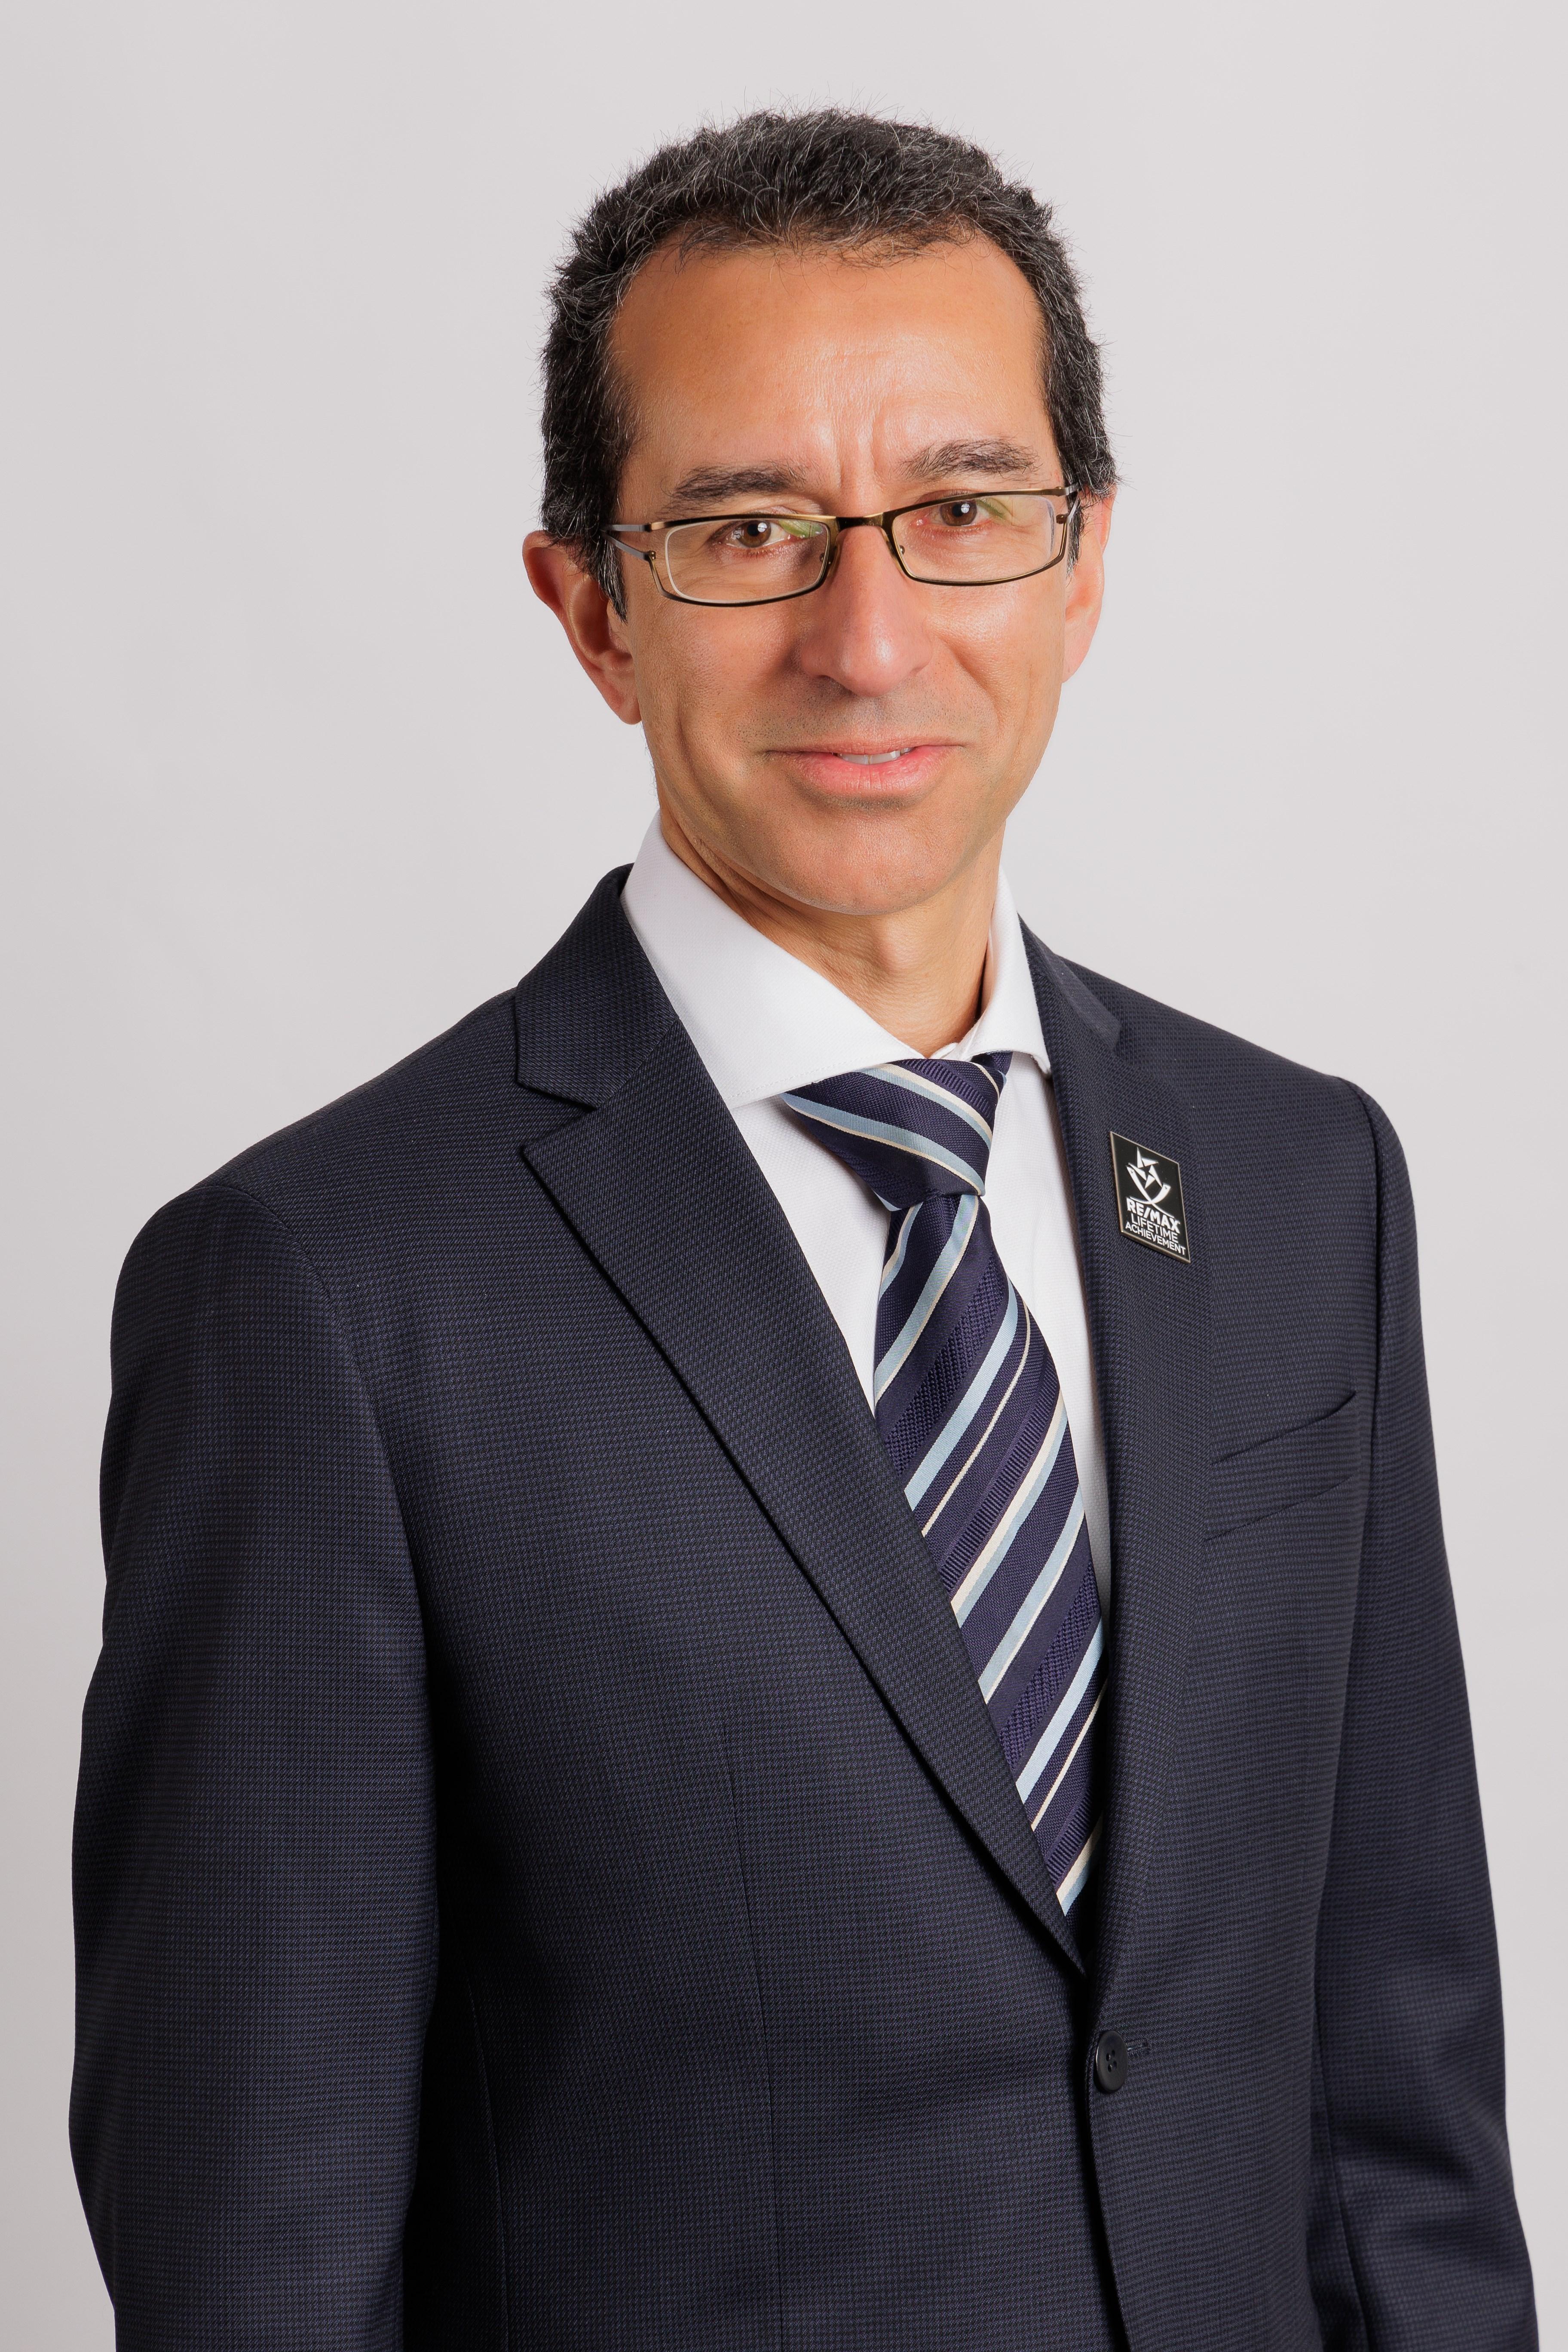 Ángel Matarranz Villagordo